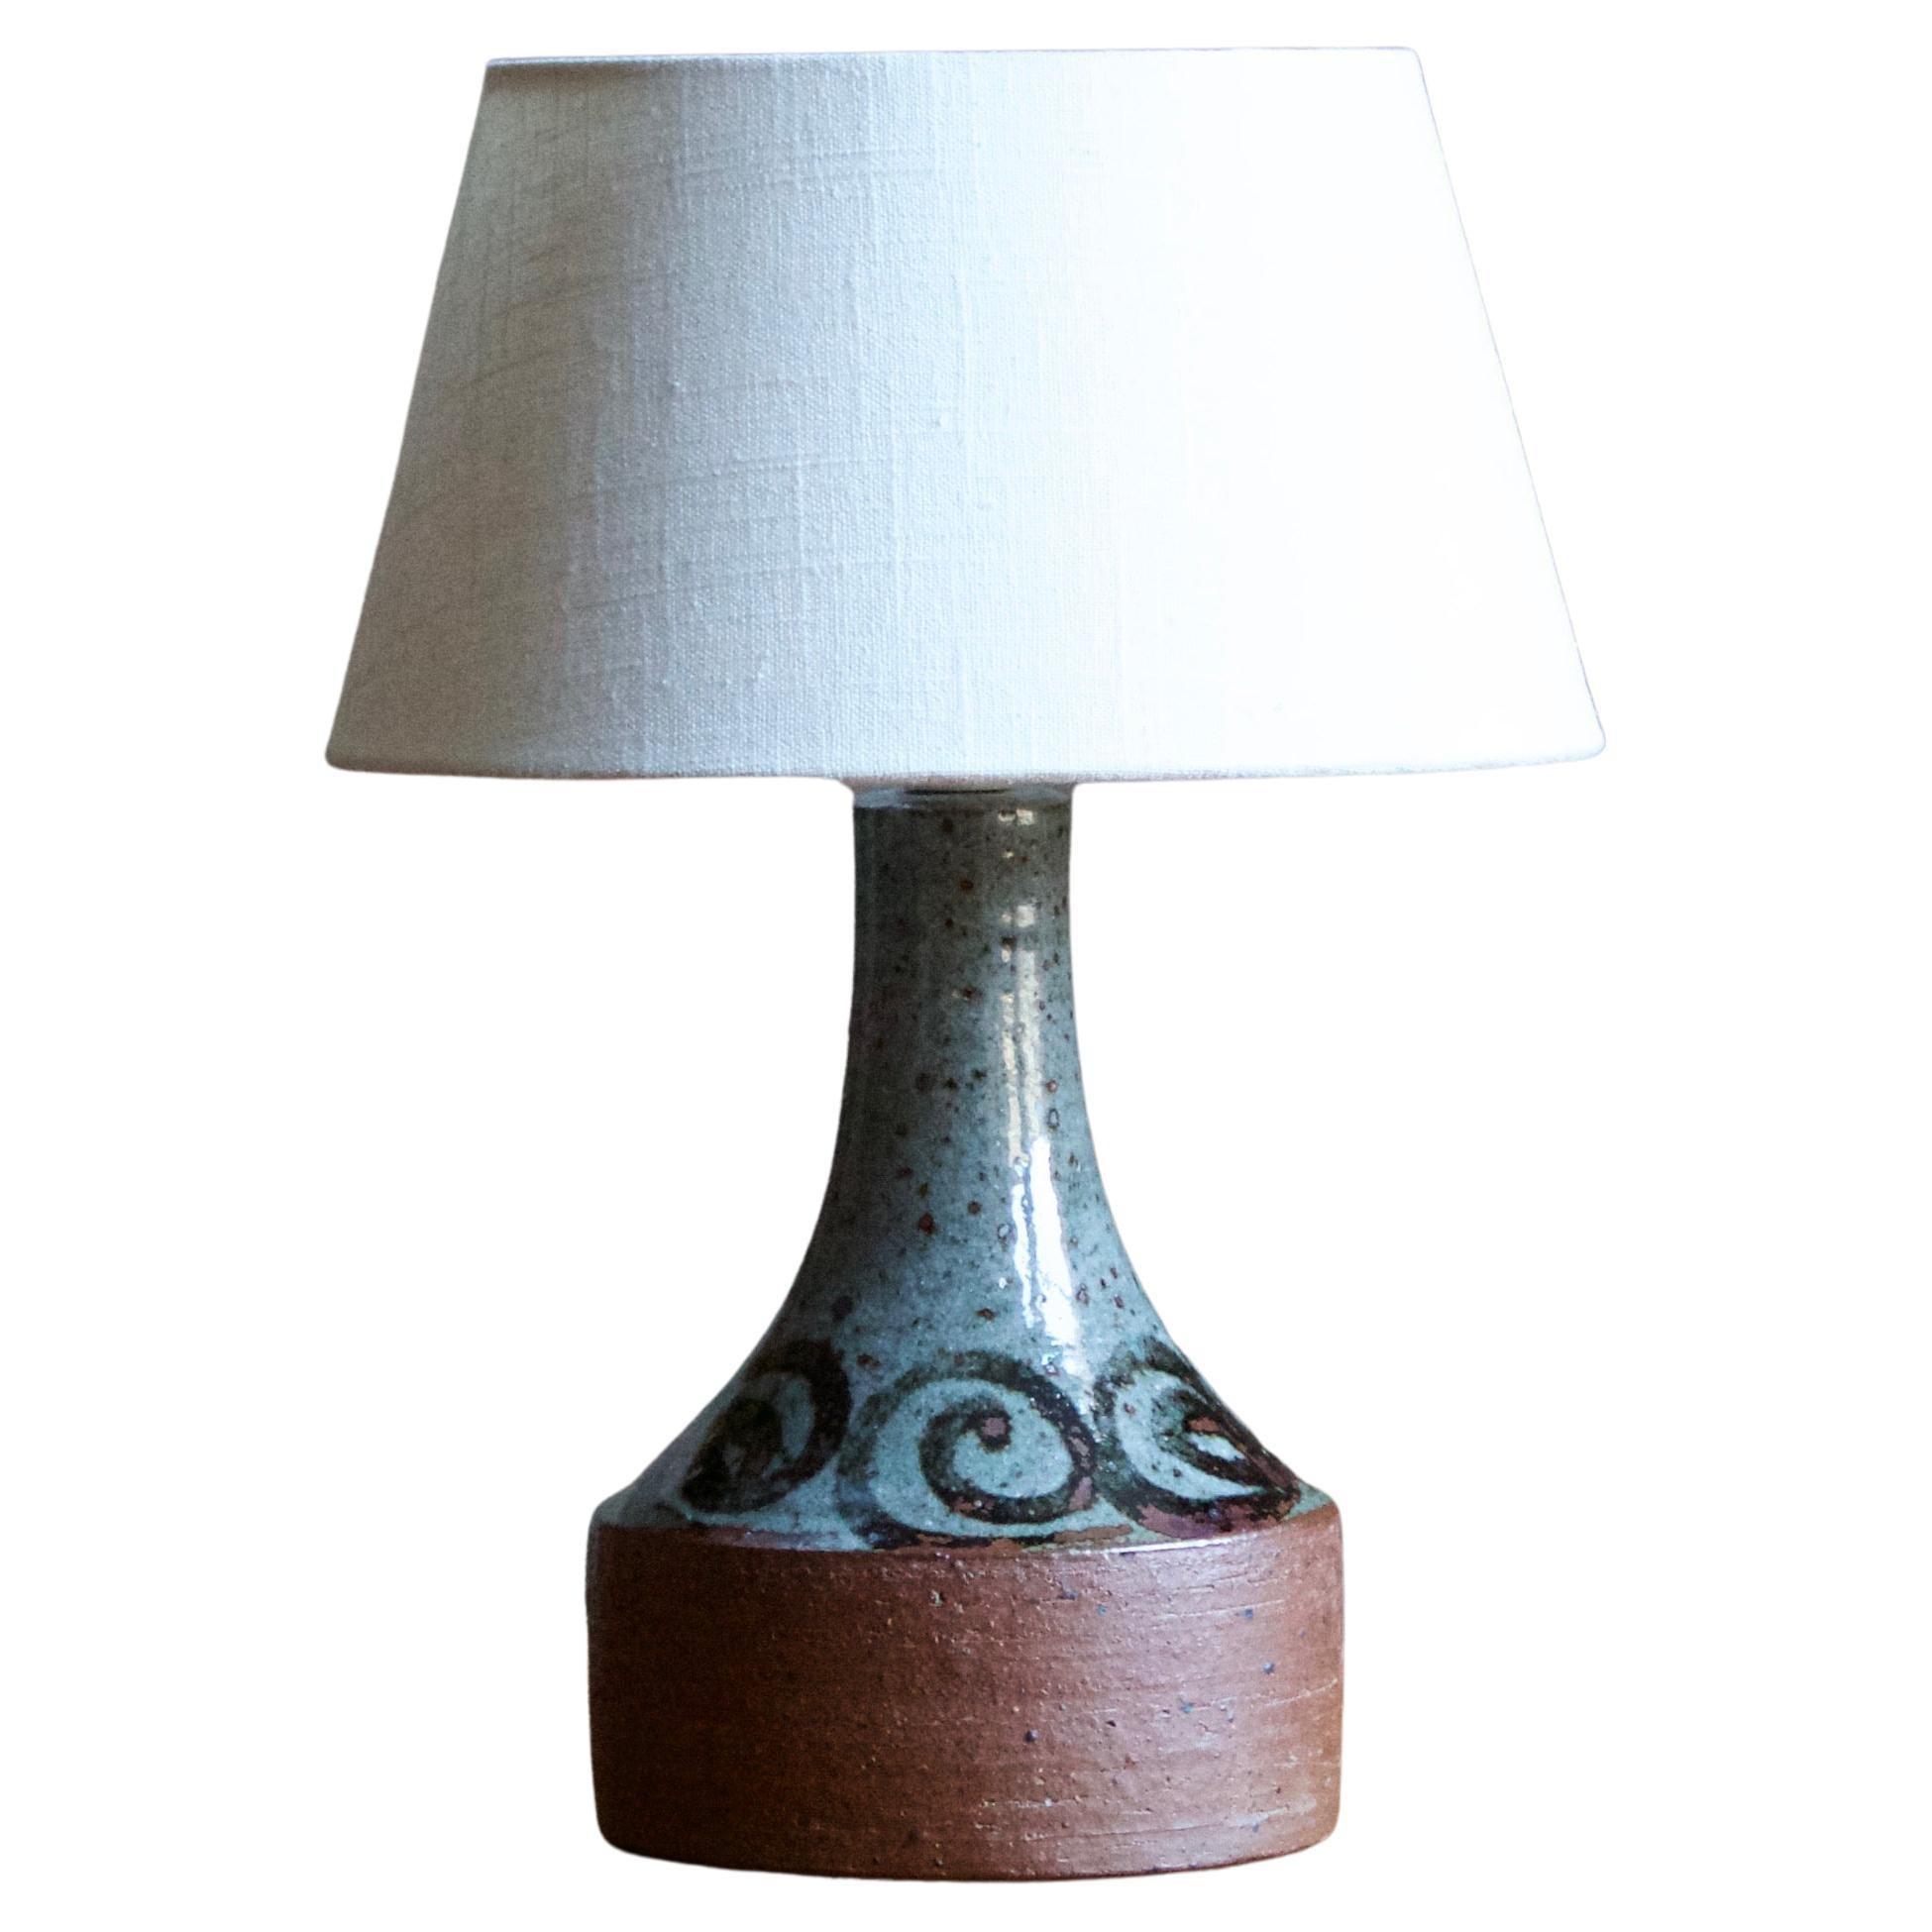 Helle Allpass, Table Lamp, Semi-Glazed Stoneware, Artists Studio Denmark, 1960s